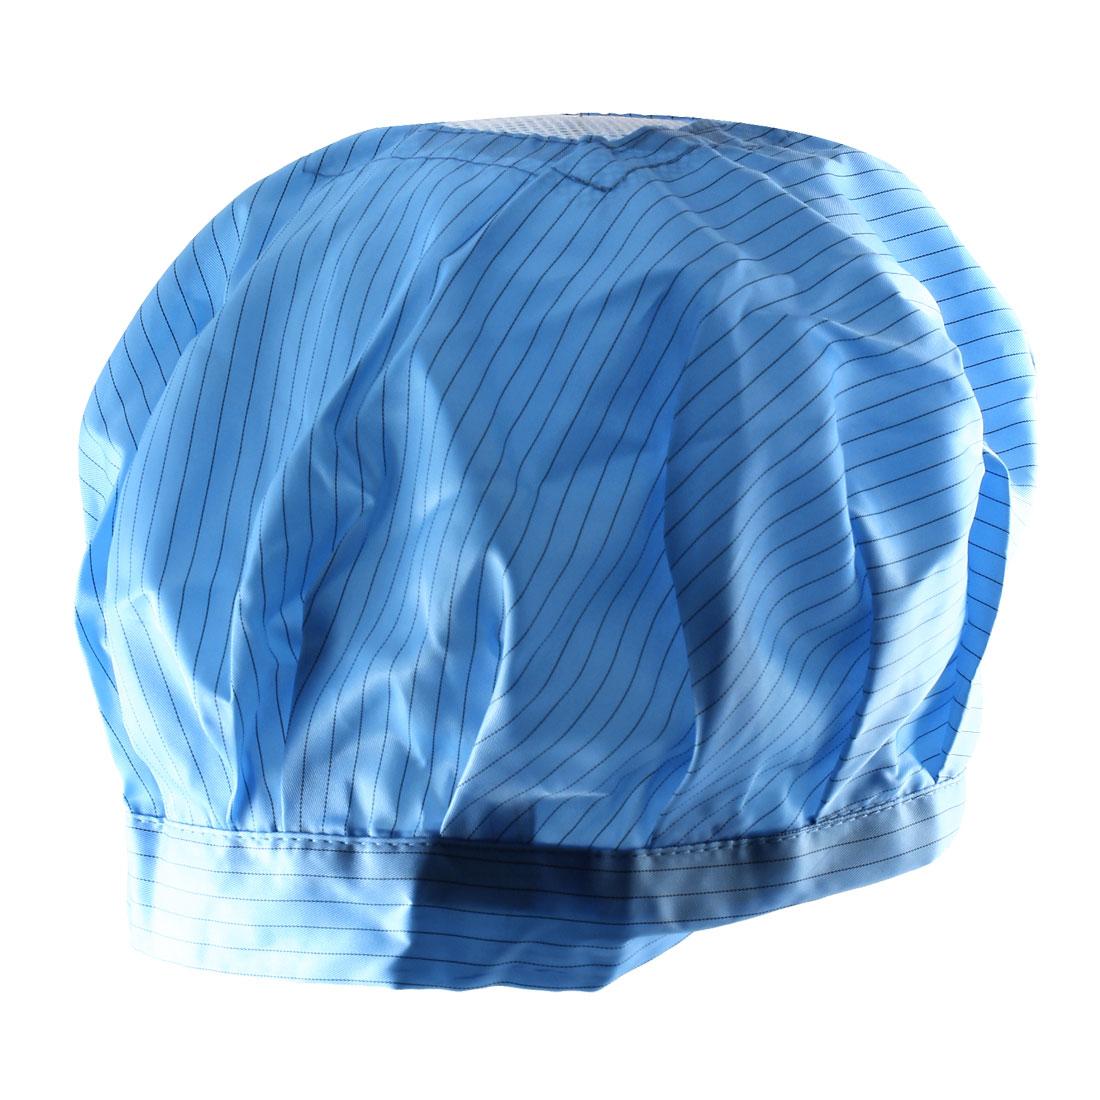 Unisex Cleanroom Hood Stripe Printed Bouffant Round Anti-Static Cap Hat Blue